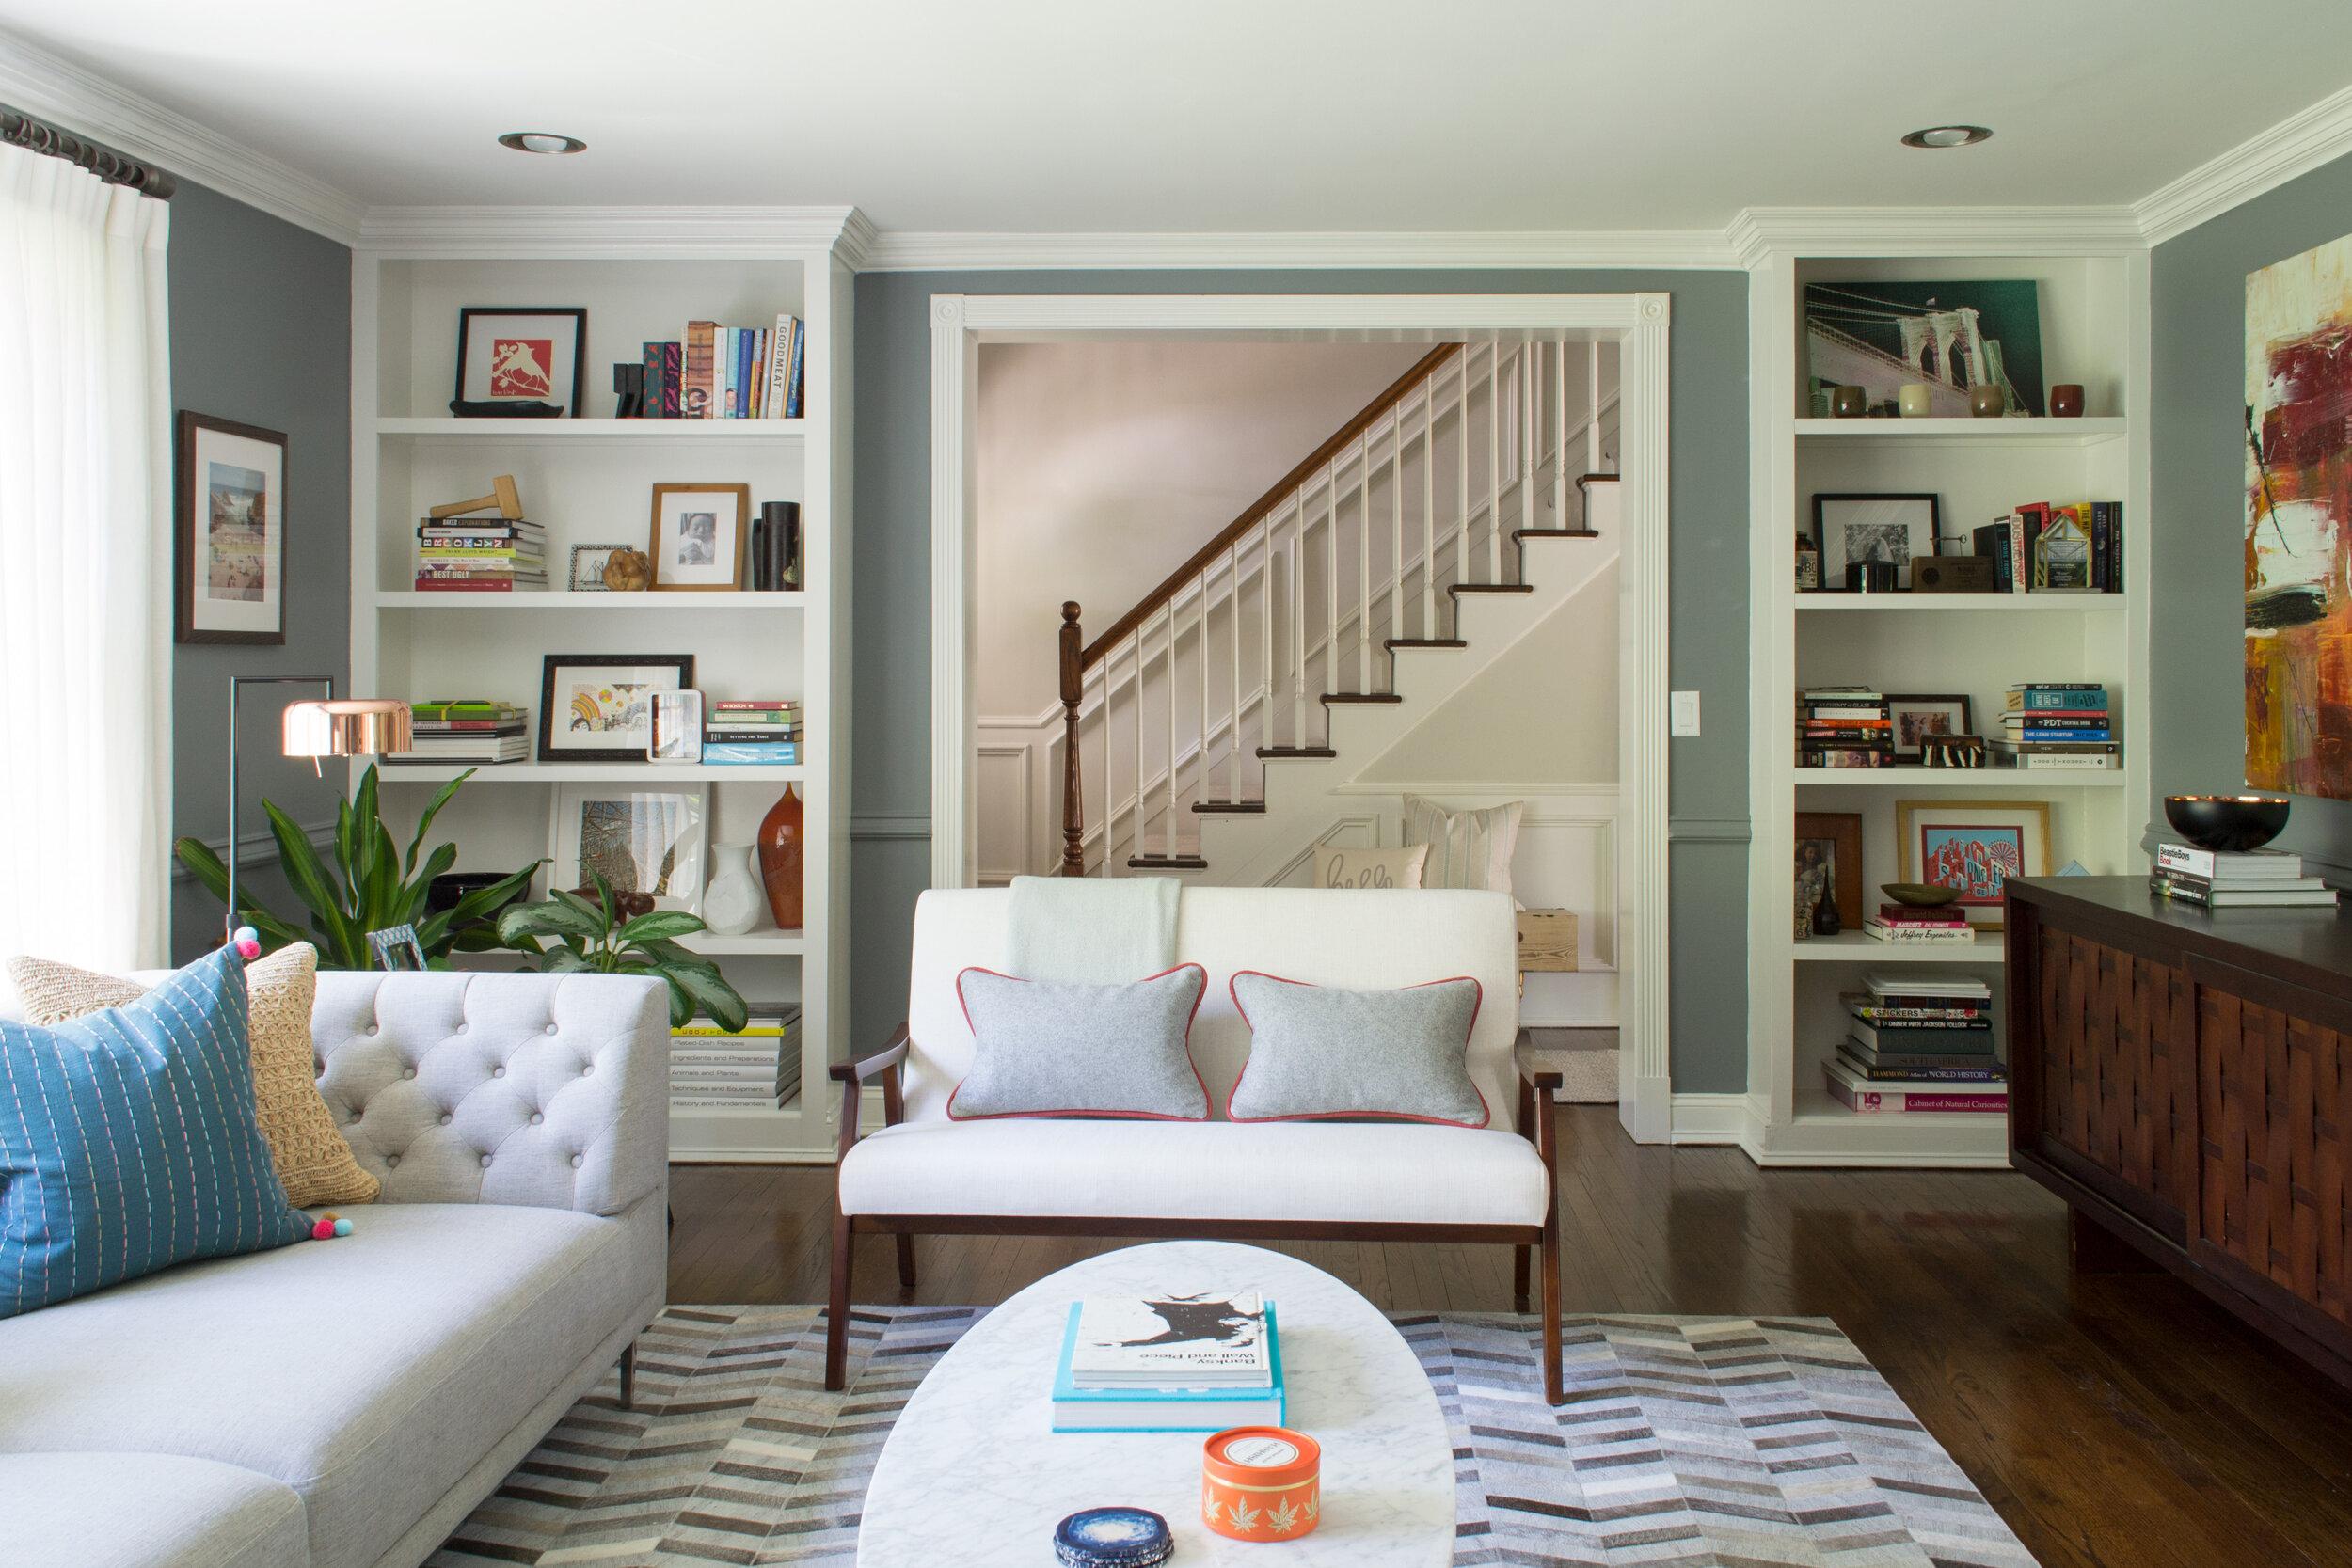 living-room-pop-of-color-tc-interiors-4.jpg